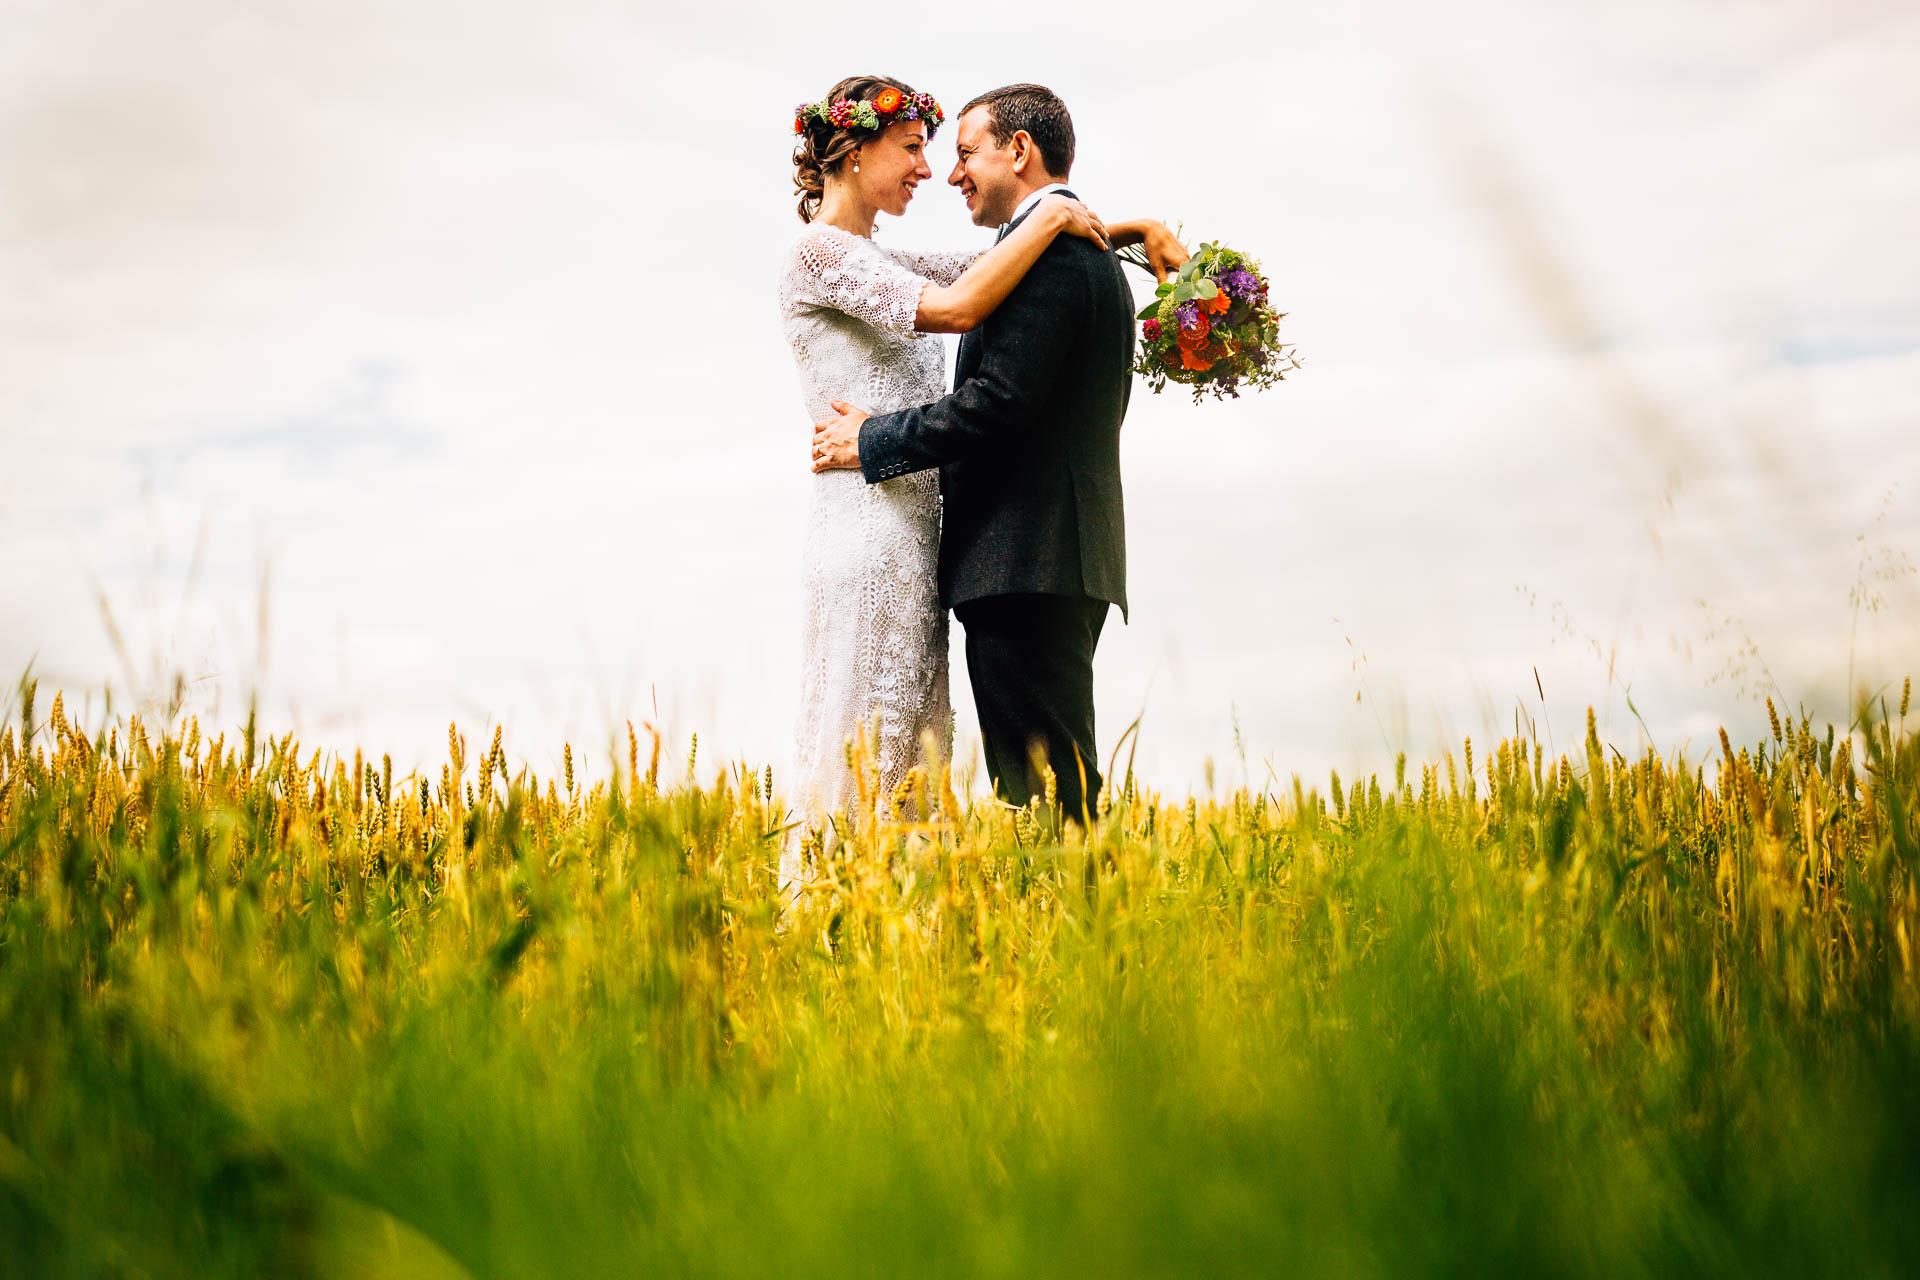 winterbourne-medieval-barn-wedding-photography-emma-andrew-79